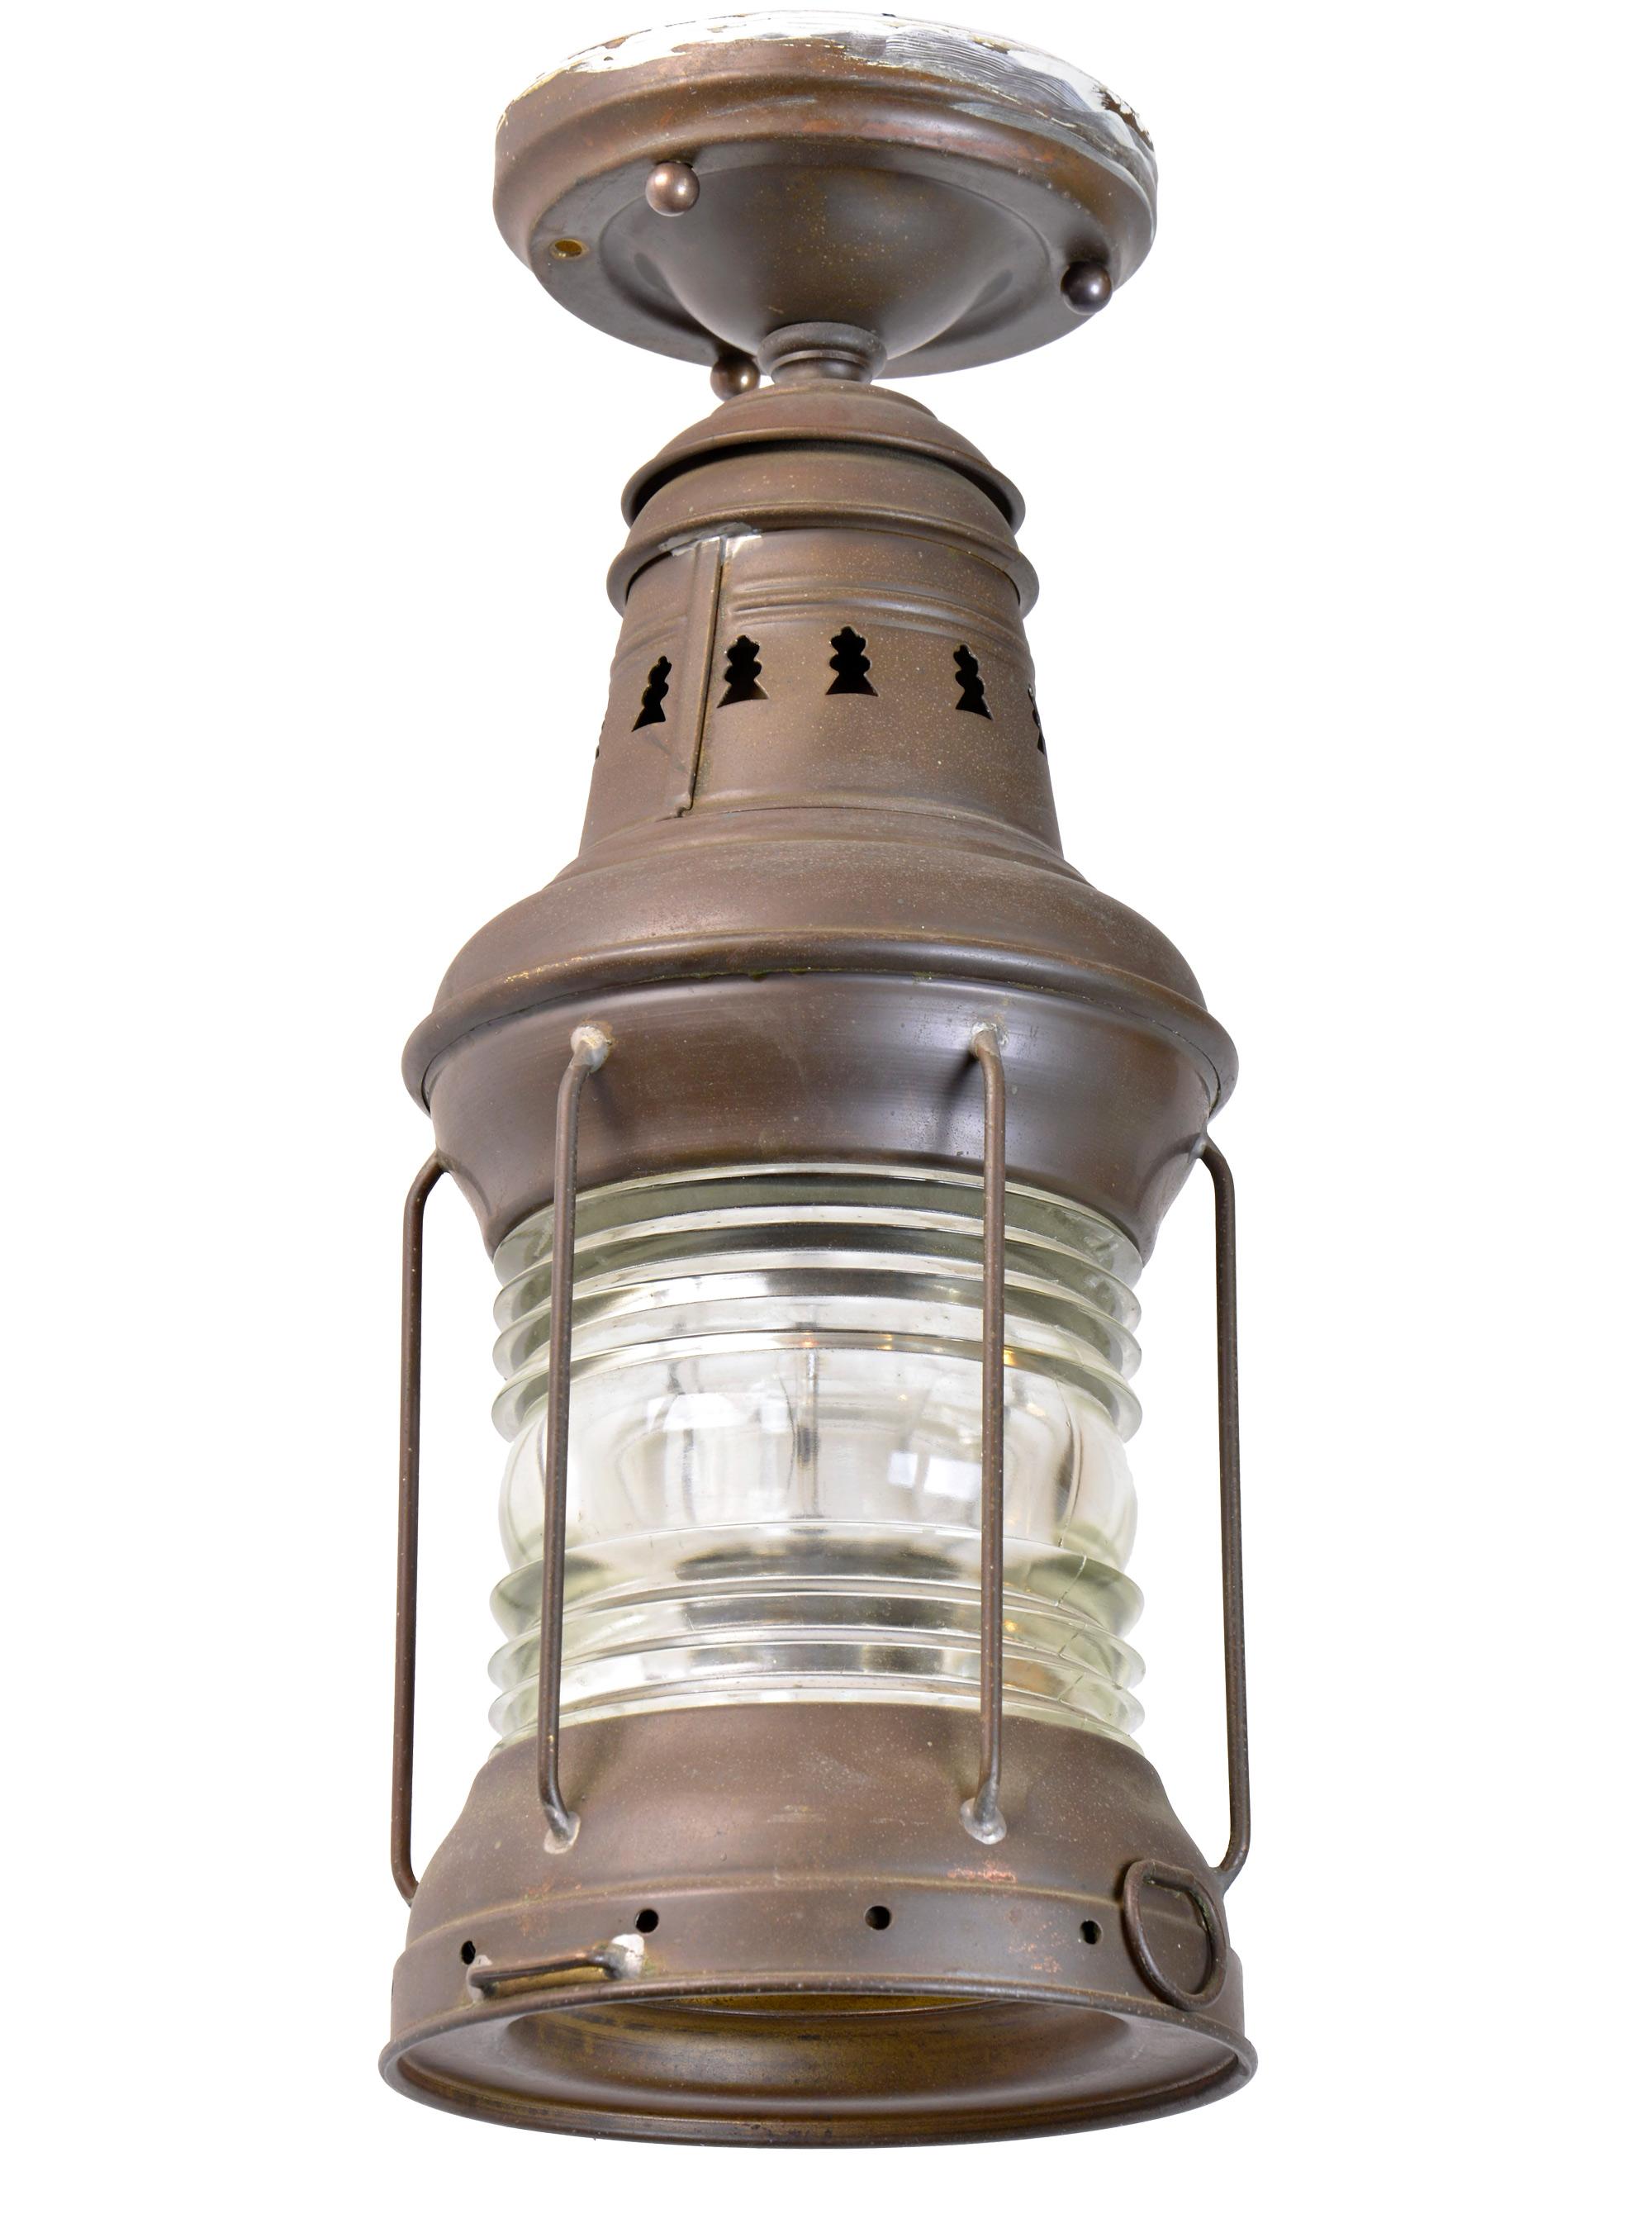 46522-russel-and-stoll-marine-light-angle.jpg